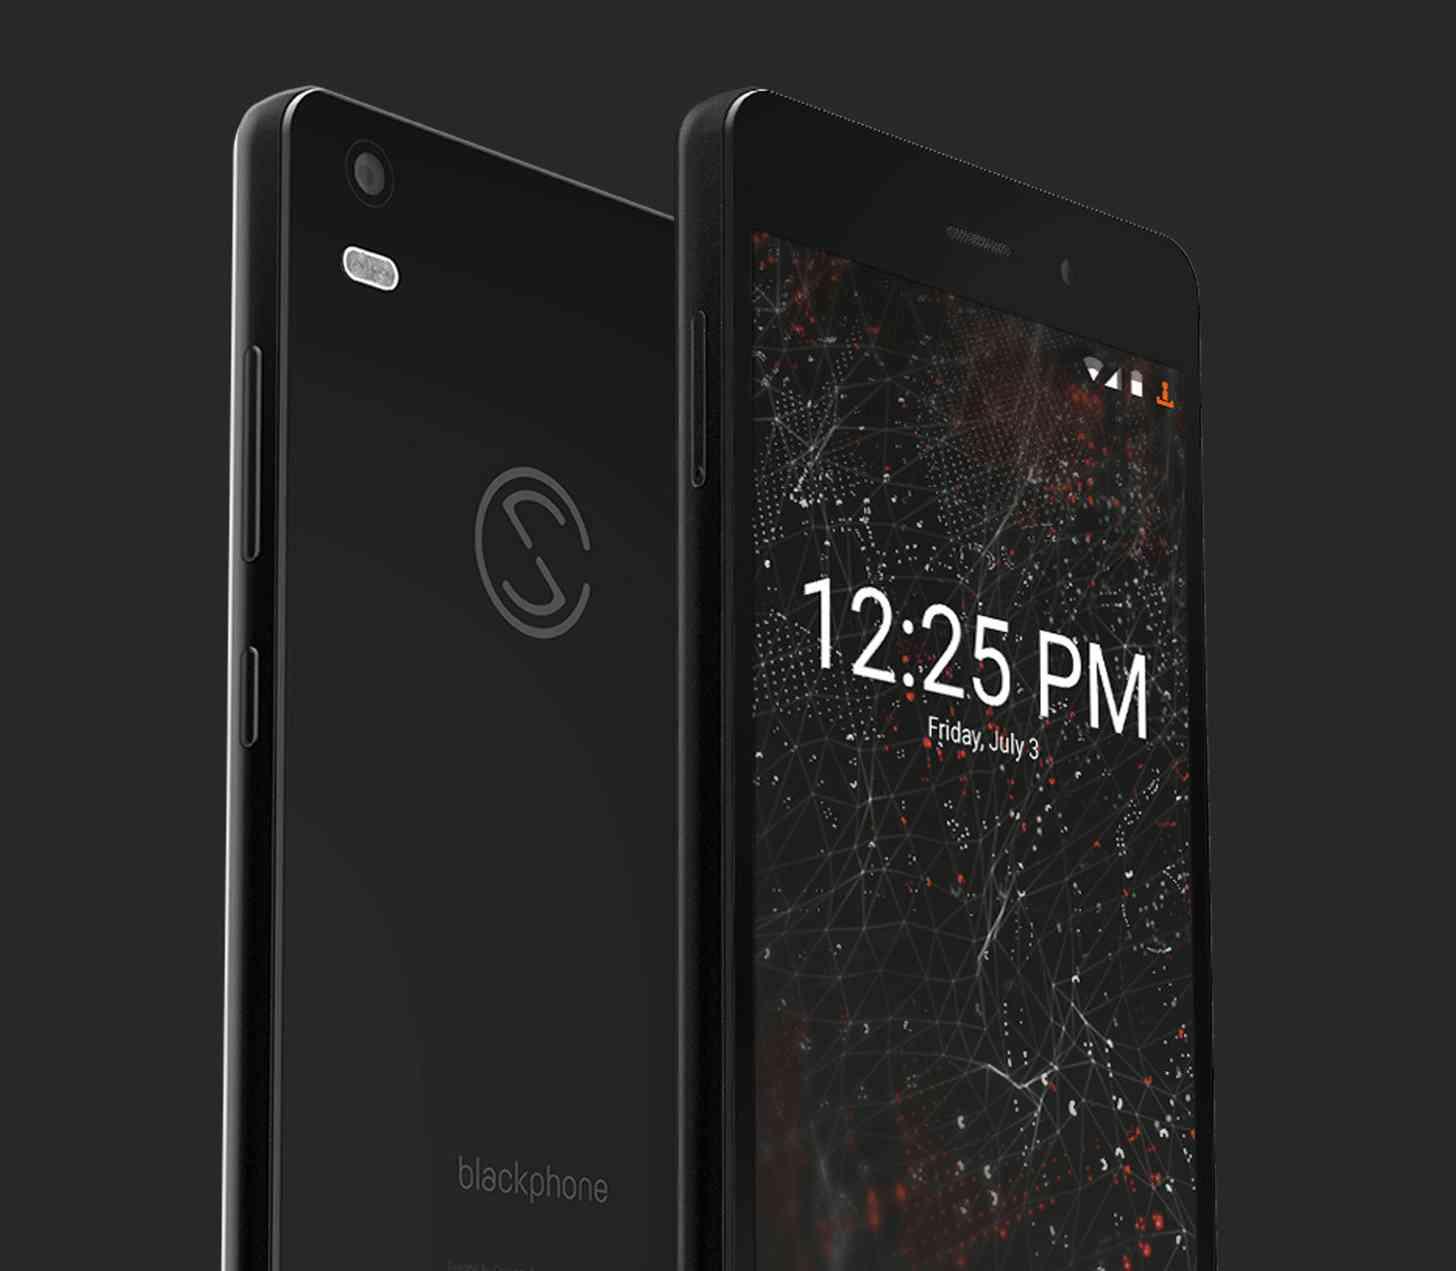 Blackphone 2 large